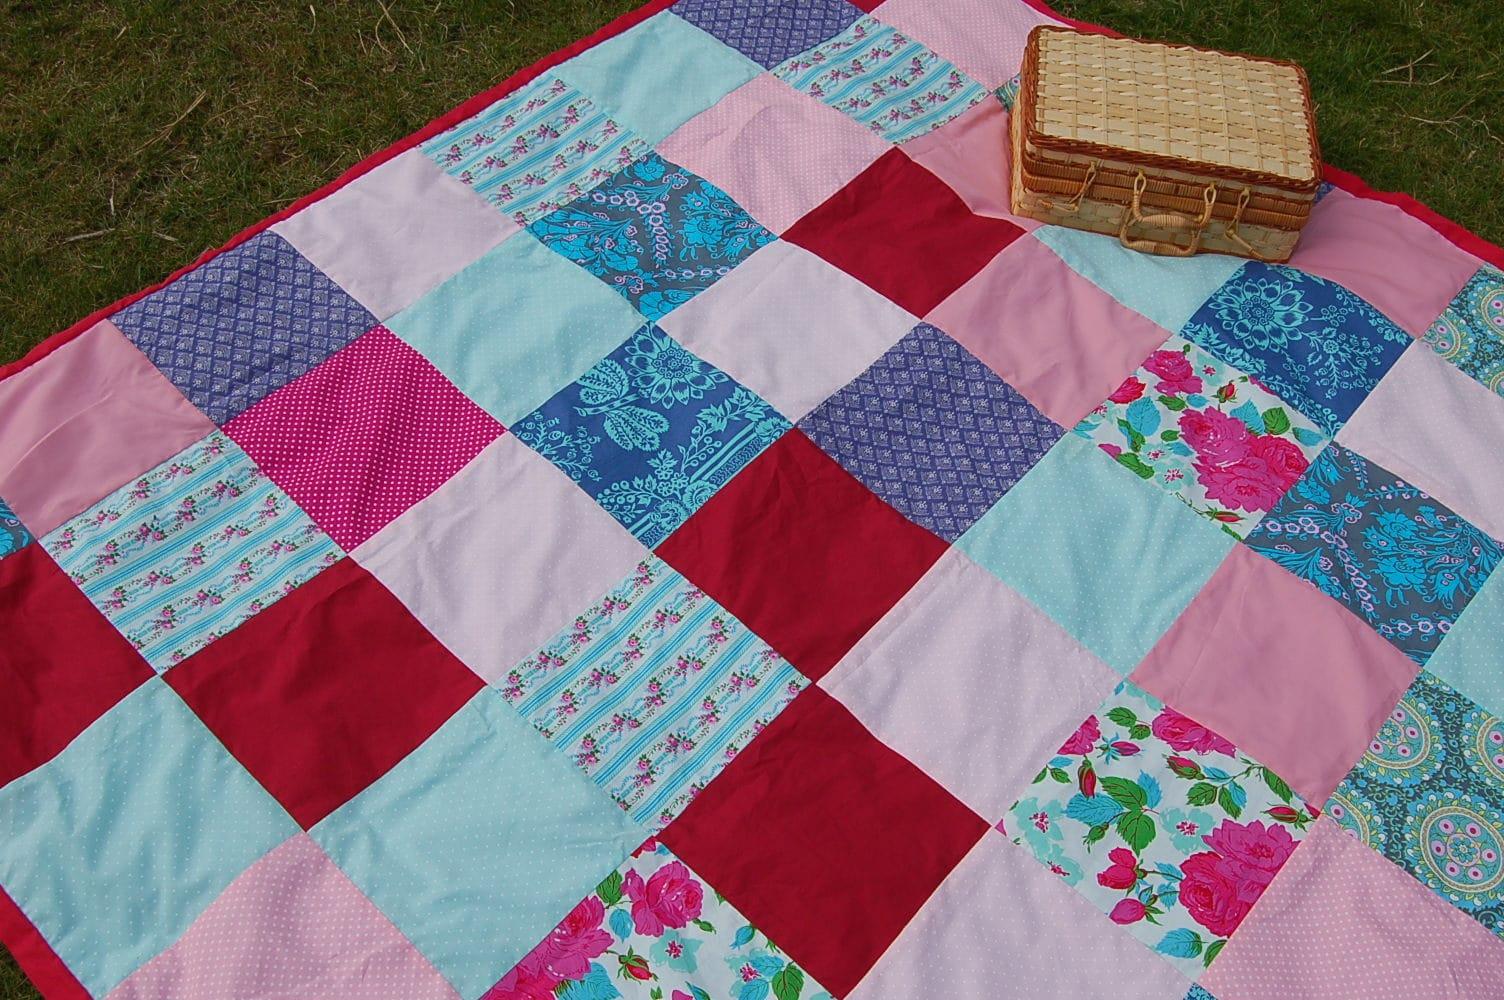 Patchwork shower curtain tutorial - Diy Picnic Blanket Tutorial